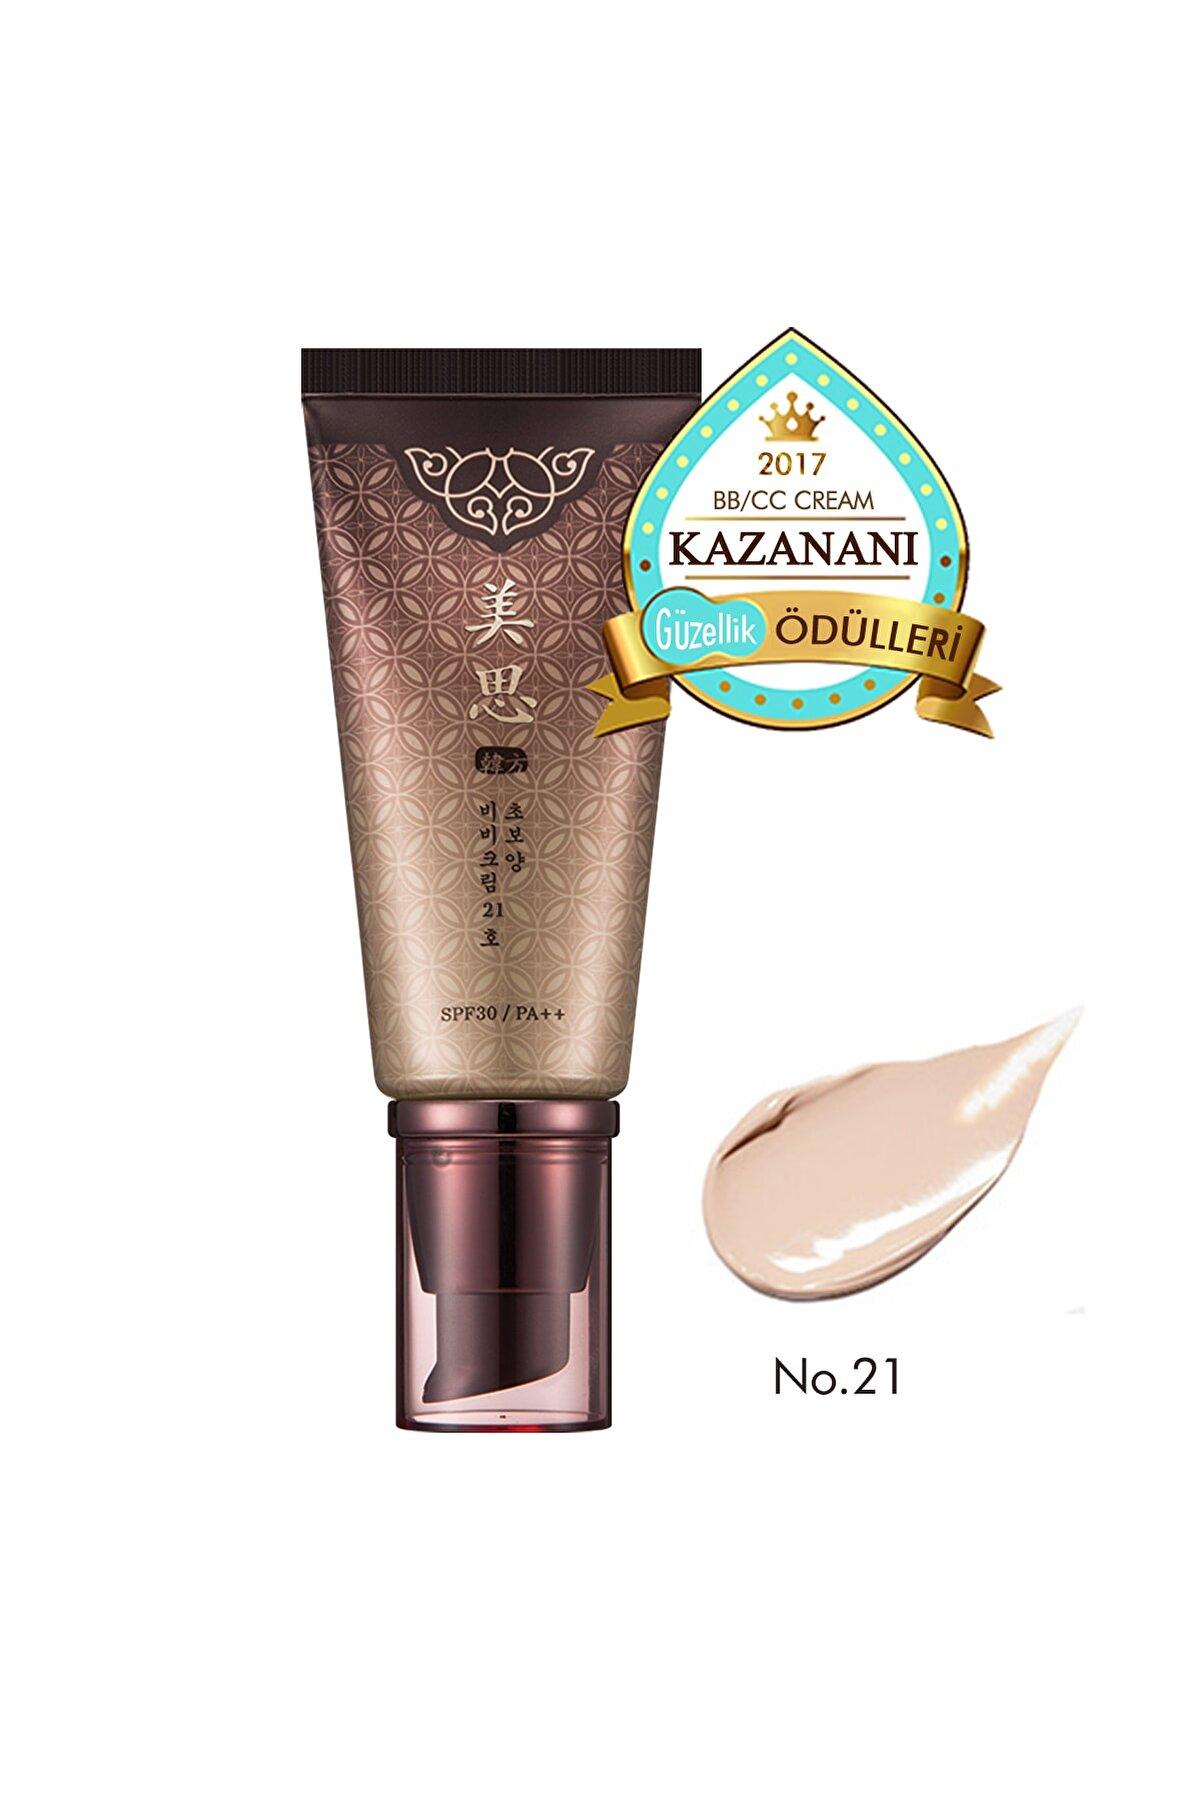 Missha Yoğun Kapatıcı Bitkisel BB Krem 50ml MISA Cho Bo Yang BB Cream SPF30/PA++ (No.21 )